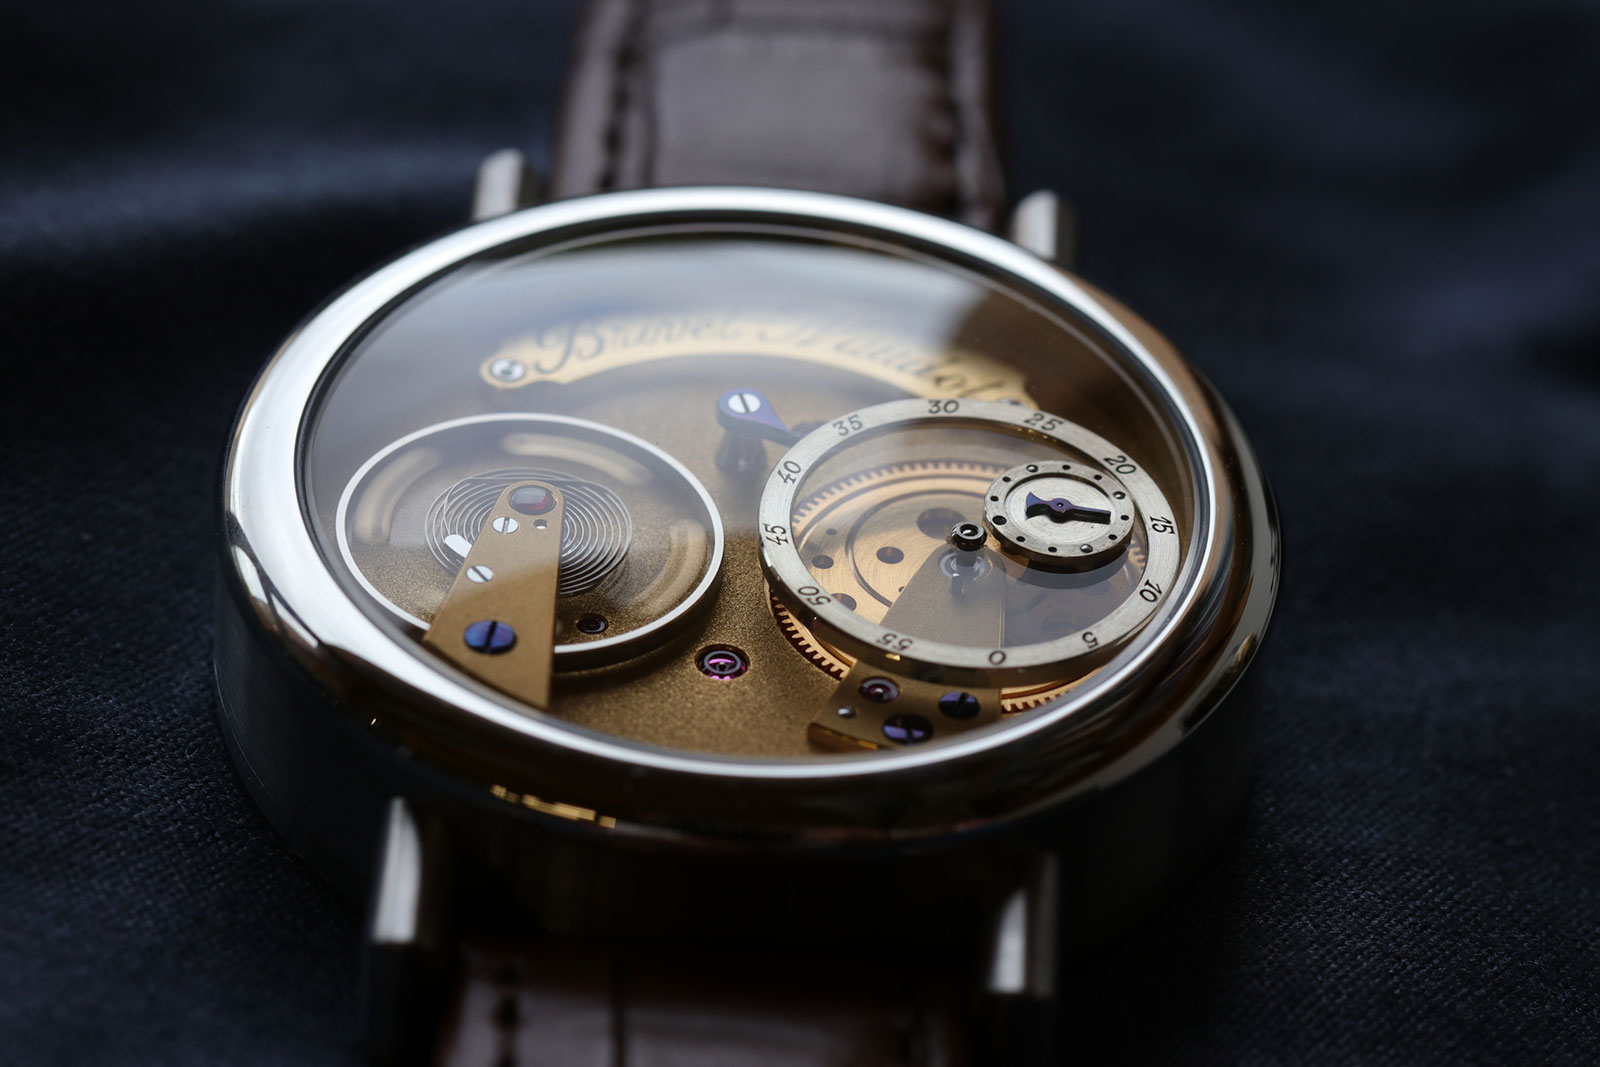 Brivet-Naudot wristwatch 3